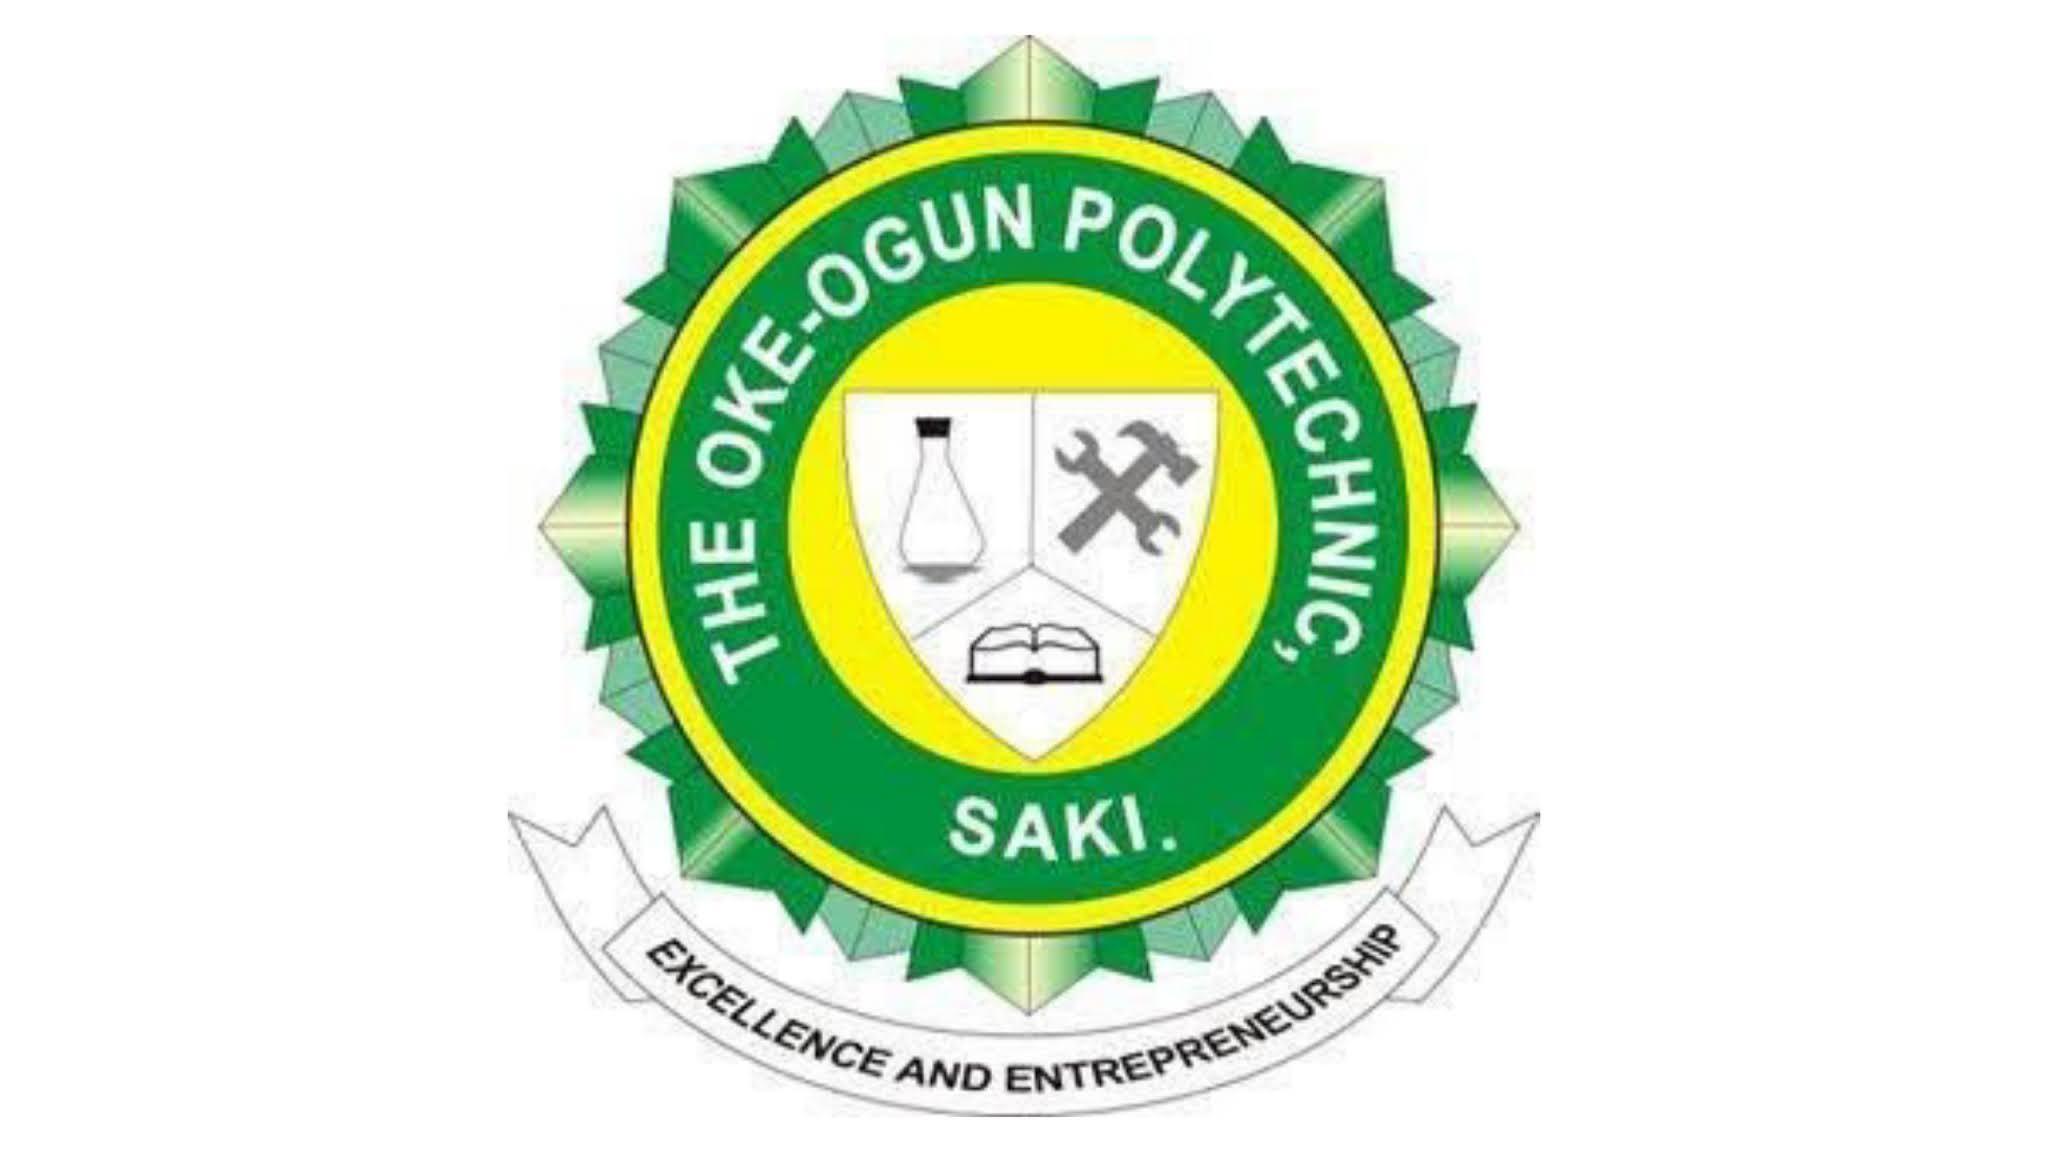 The Oke-Ogun Polytechnic Saki (TOPS) HND Admission Form for 2020/2021 Academic session